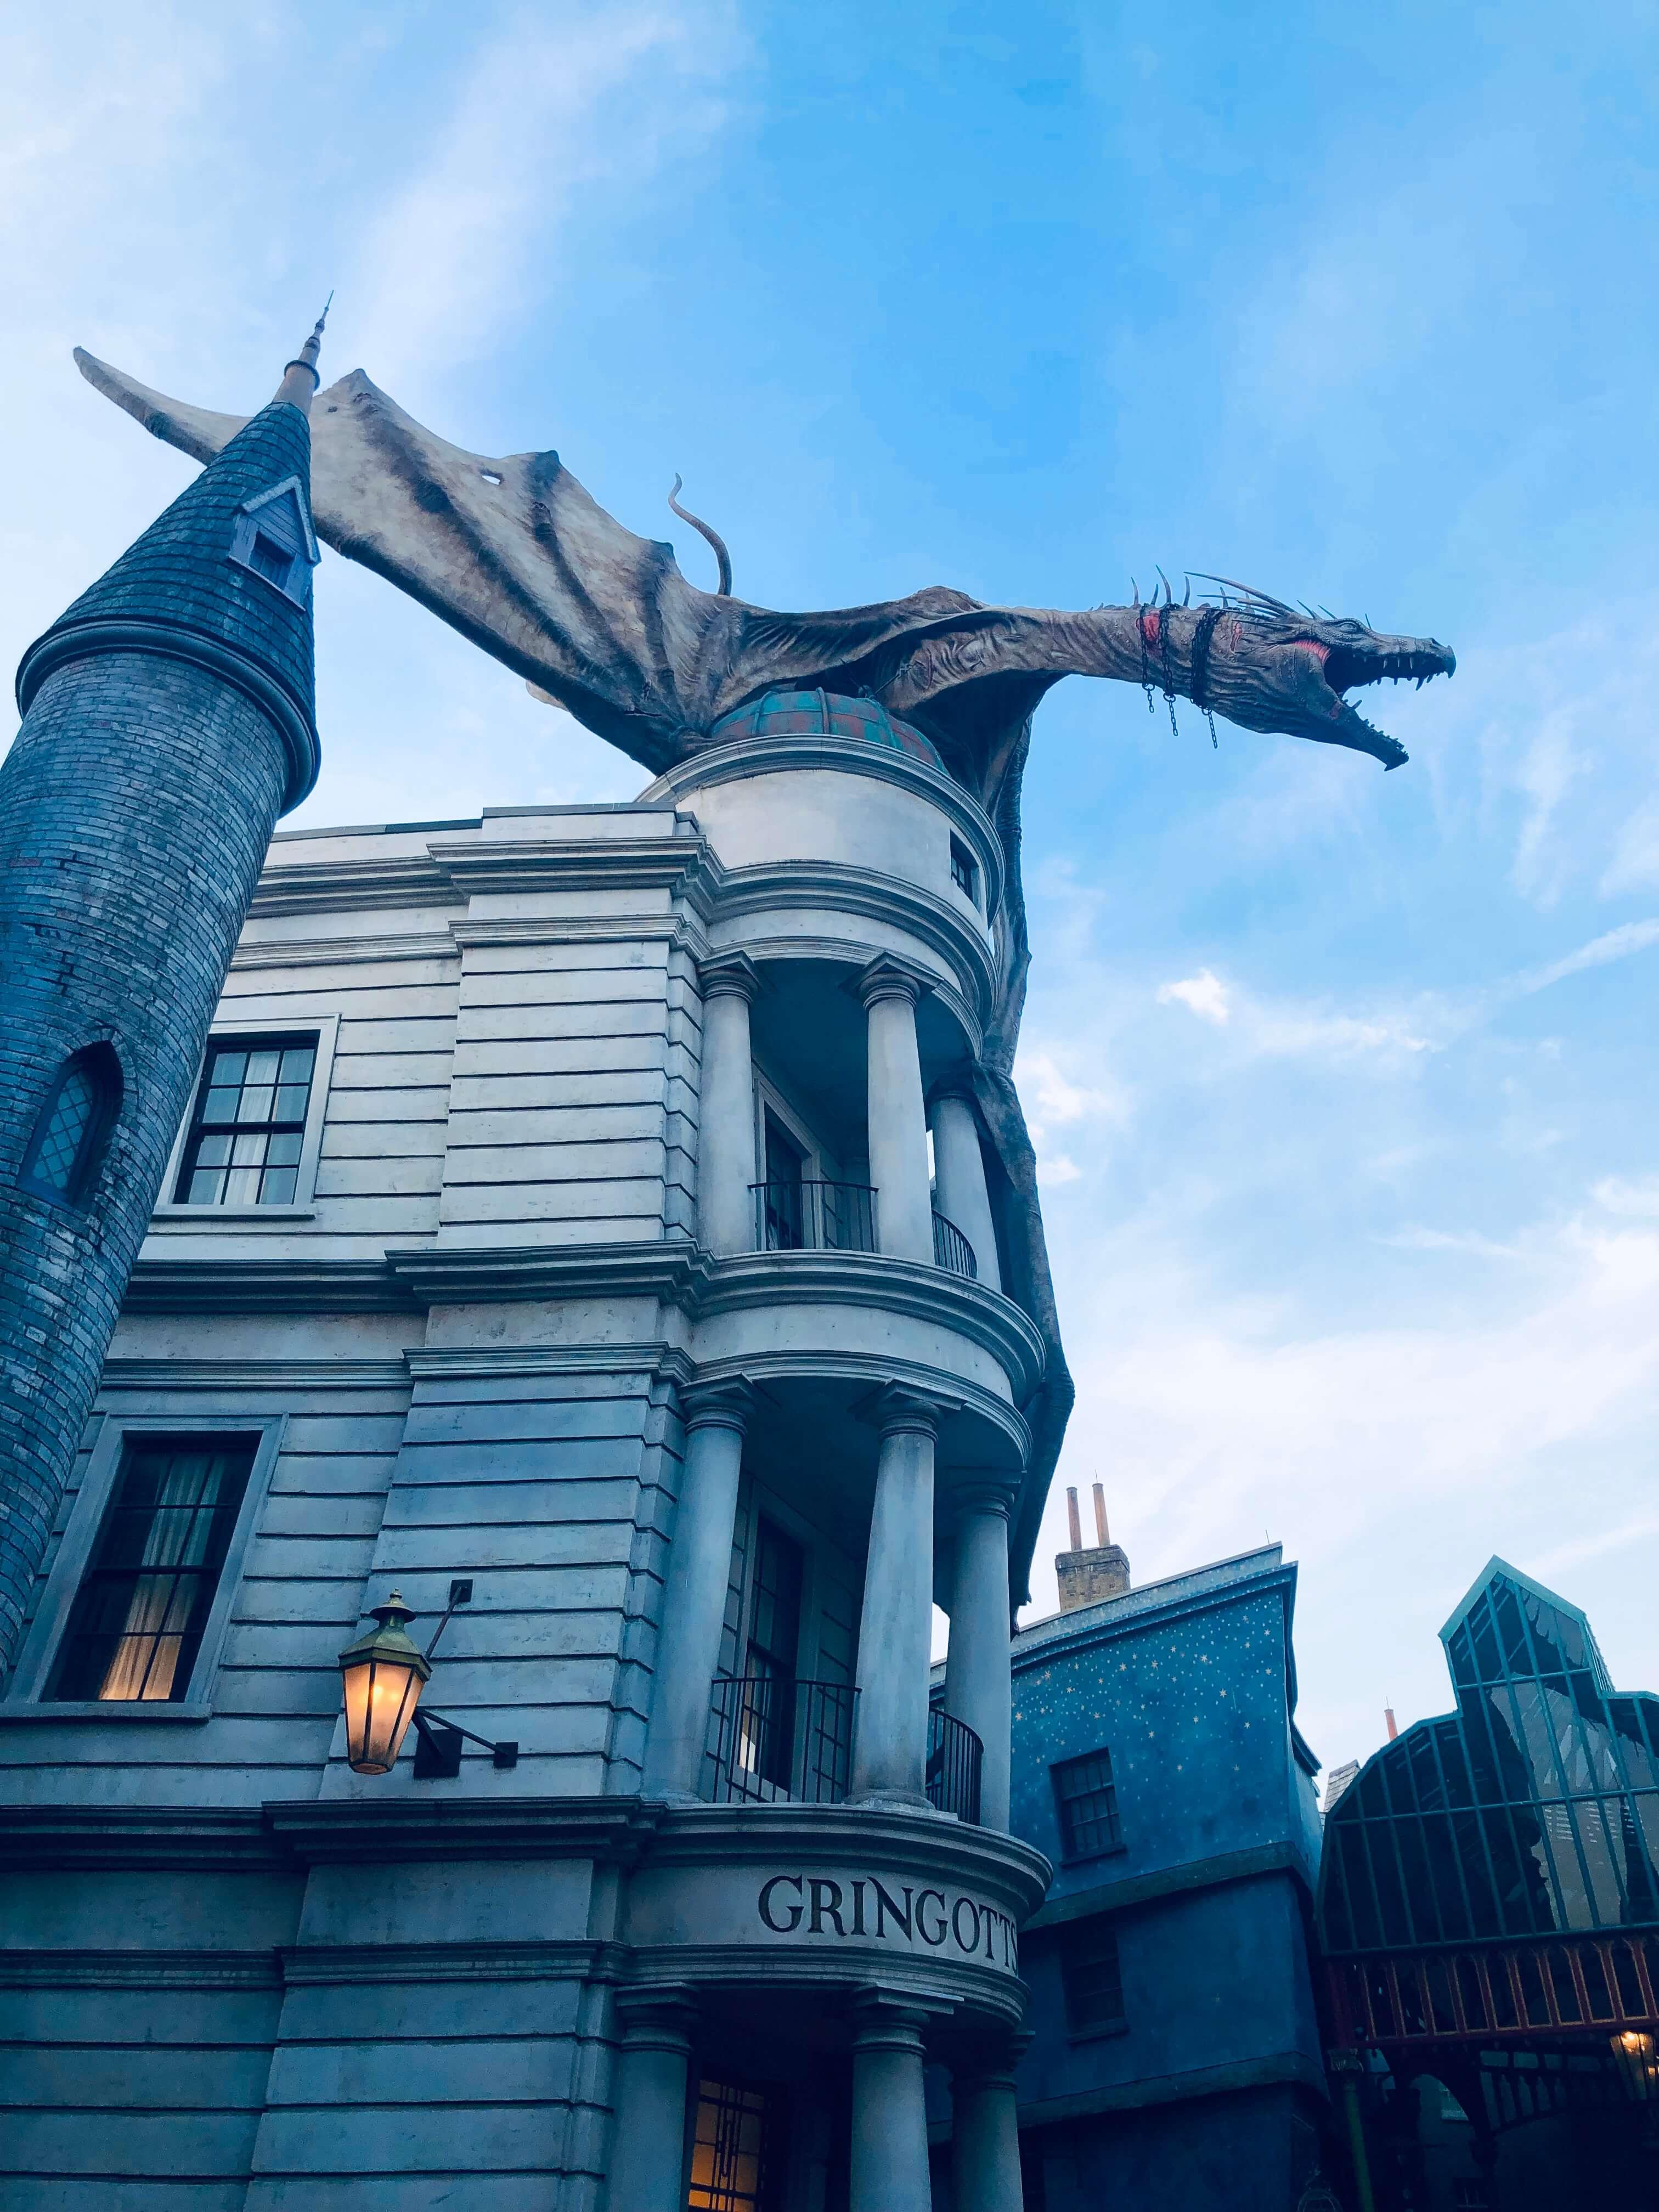 Harry Potter World - Universal